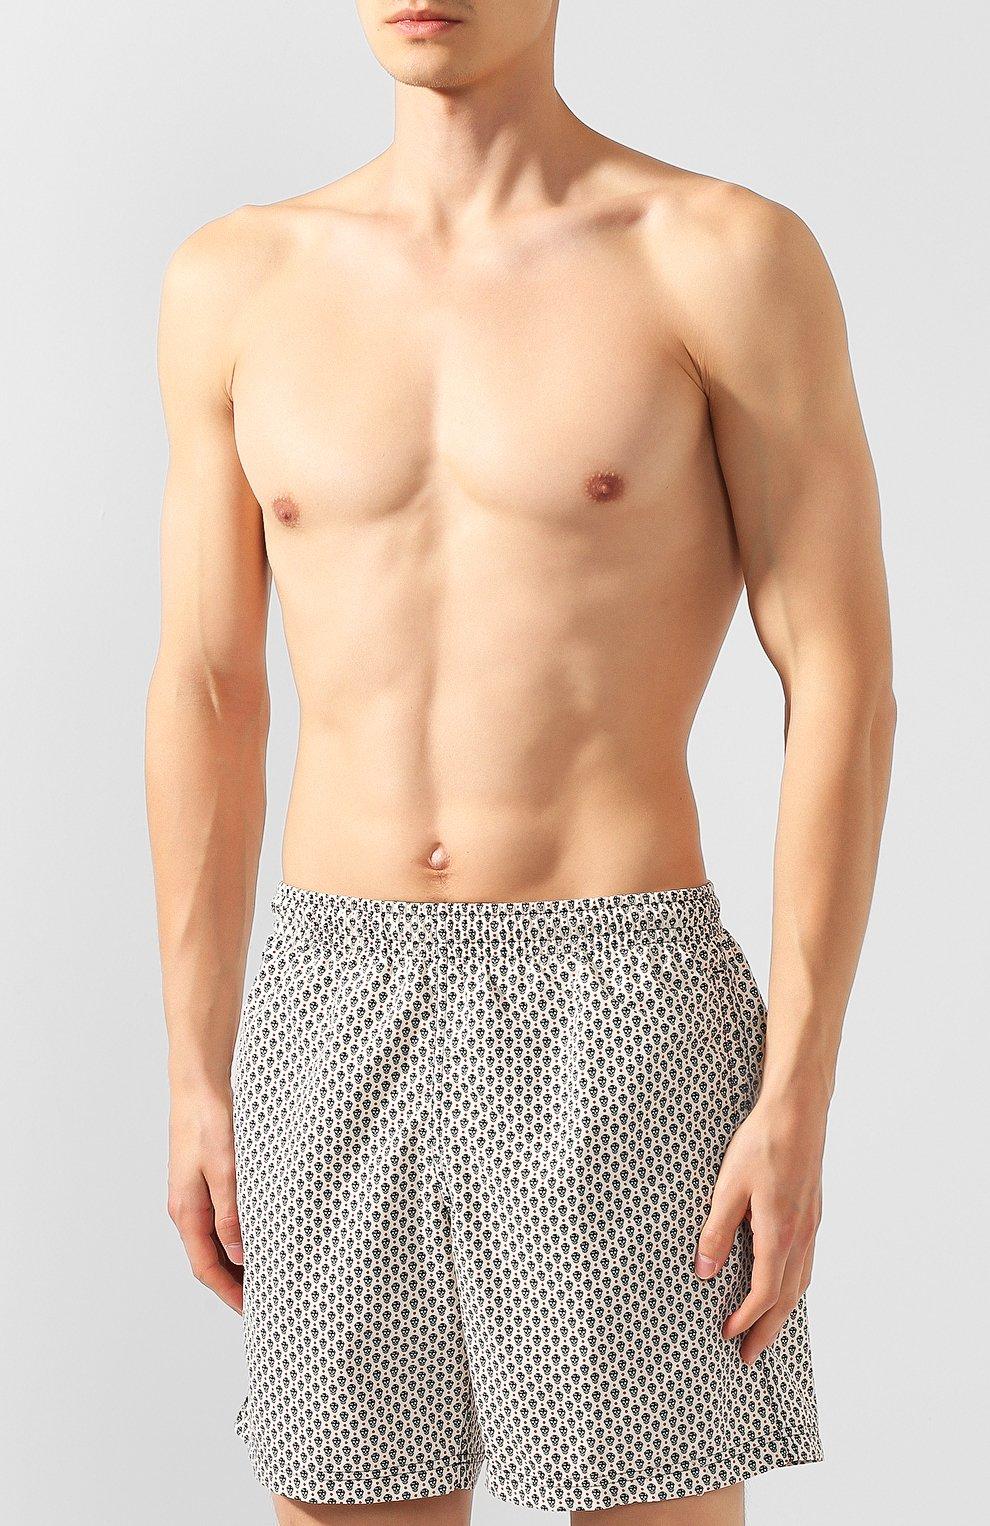 Плавки-шорты | Фото №3